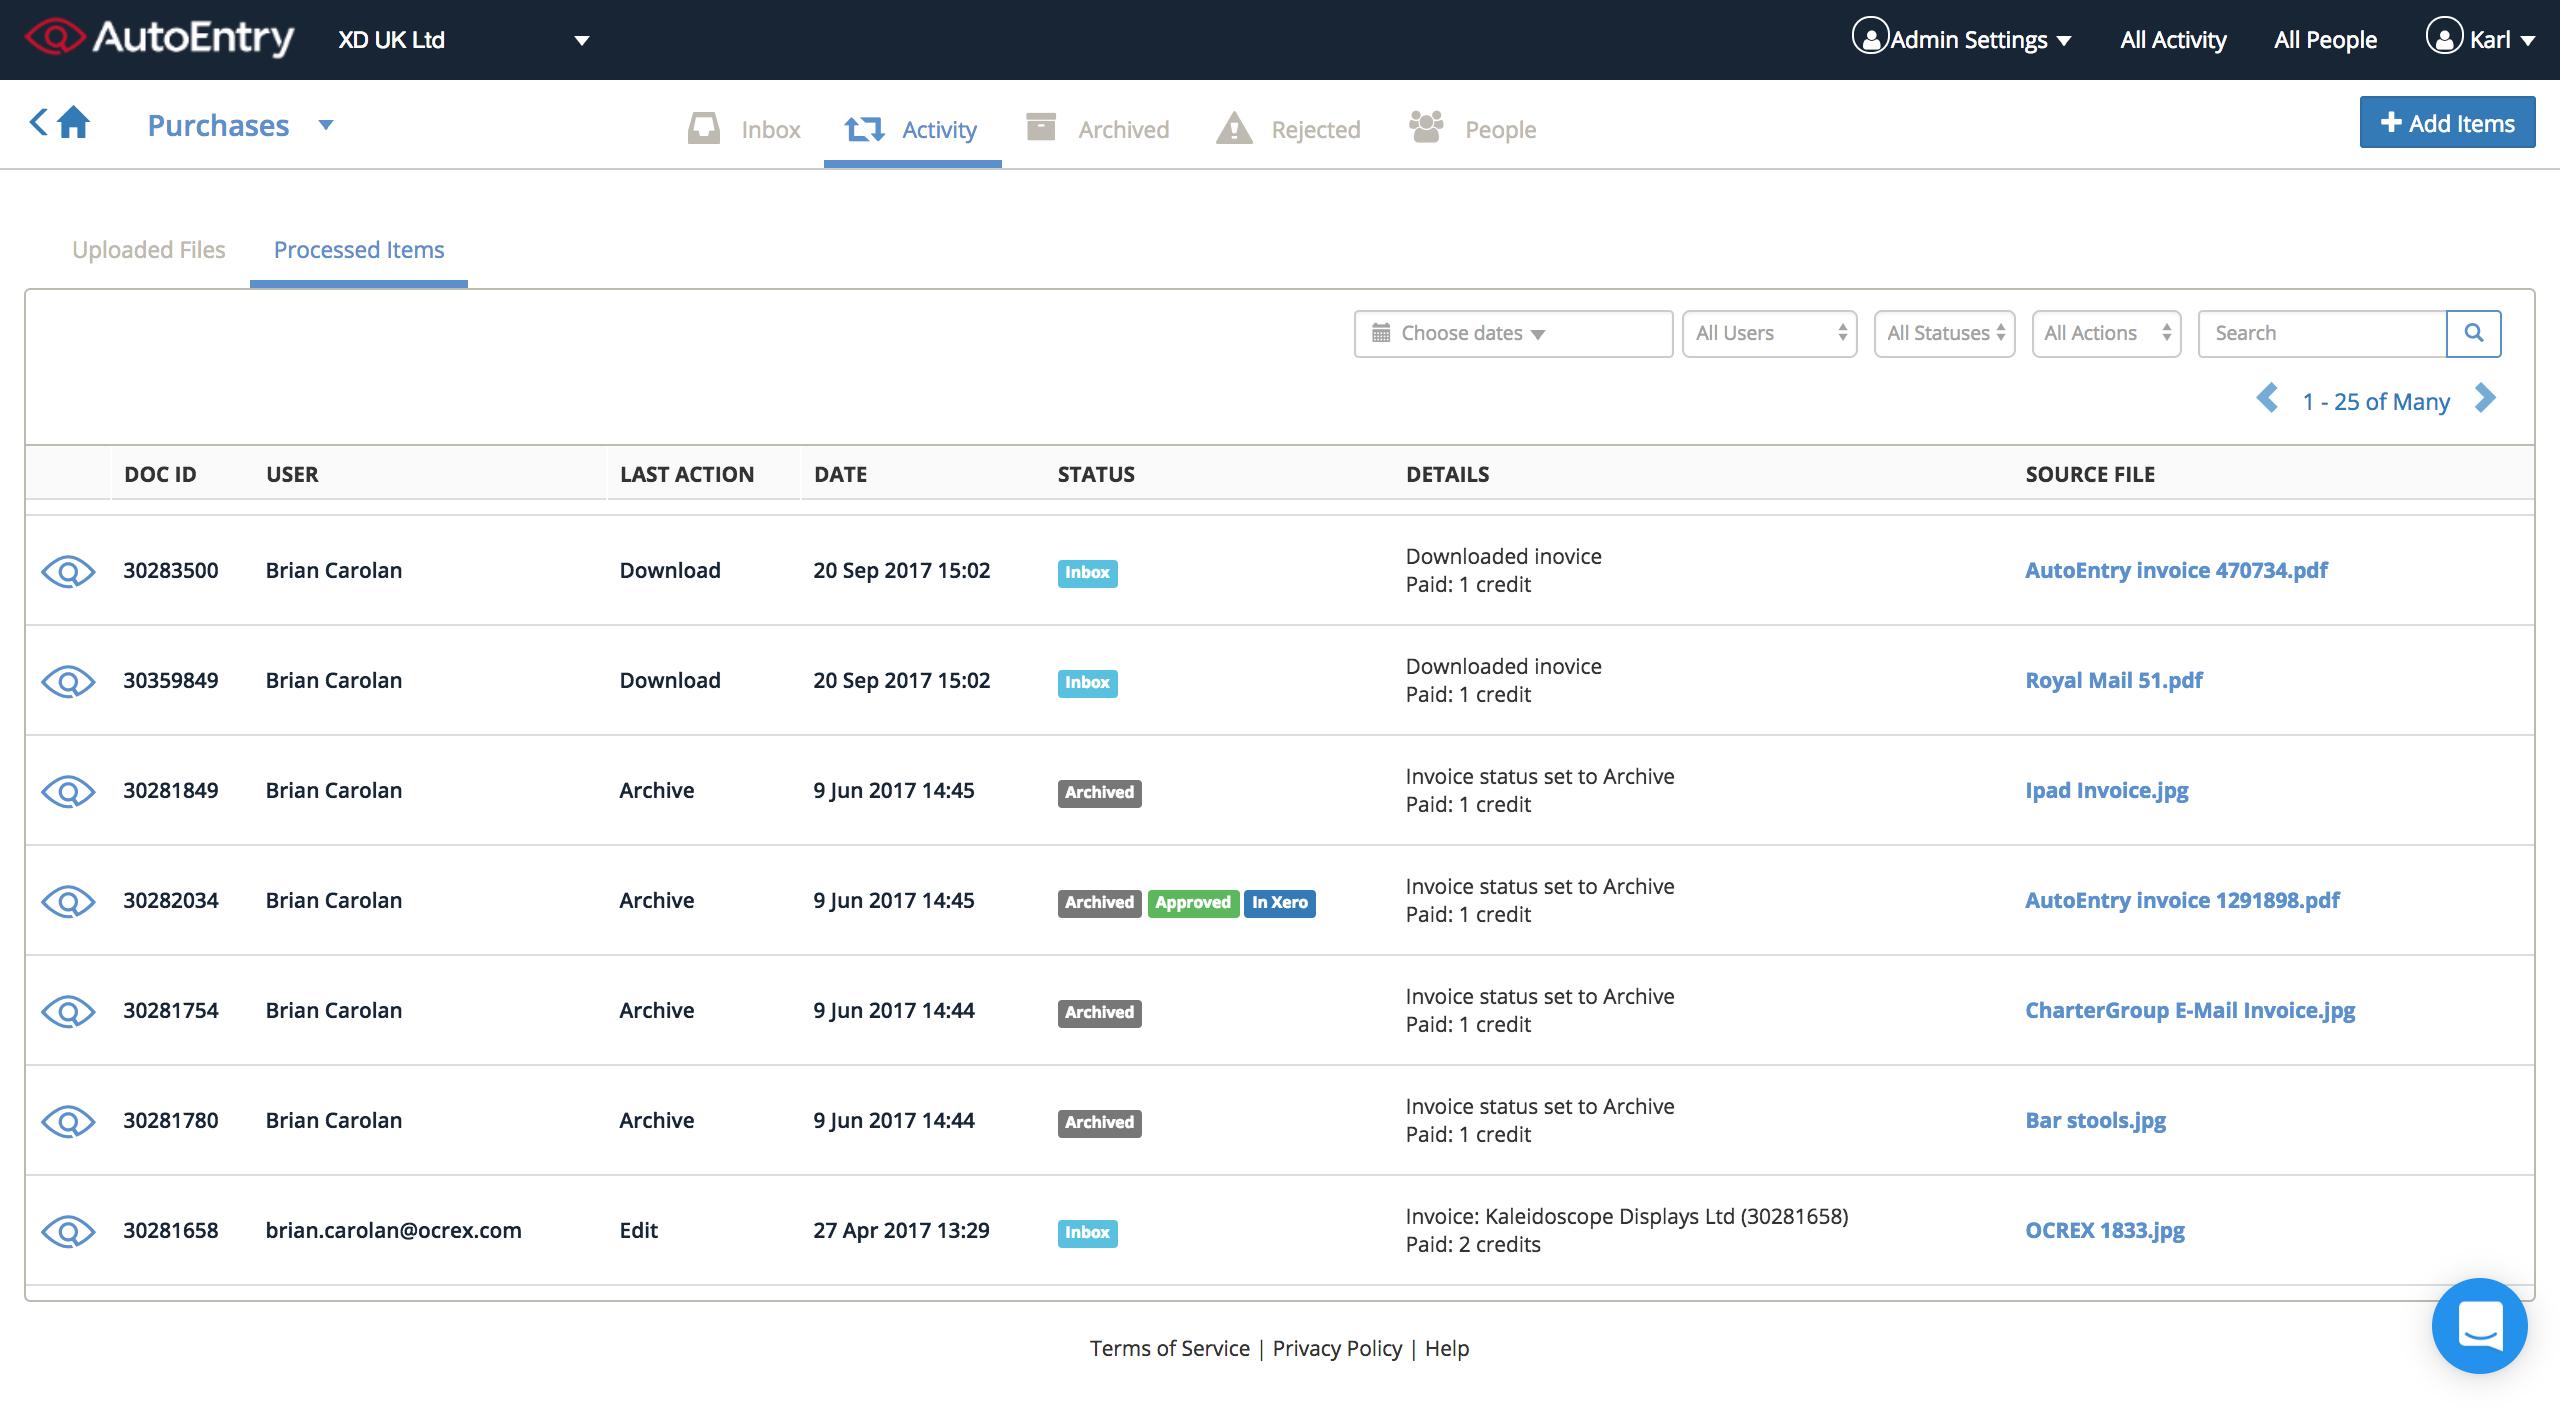 AutoEntry Software - AutoEntry Processed Items